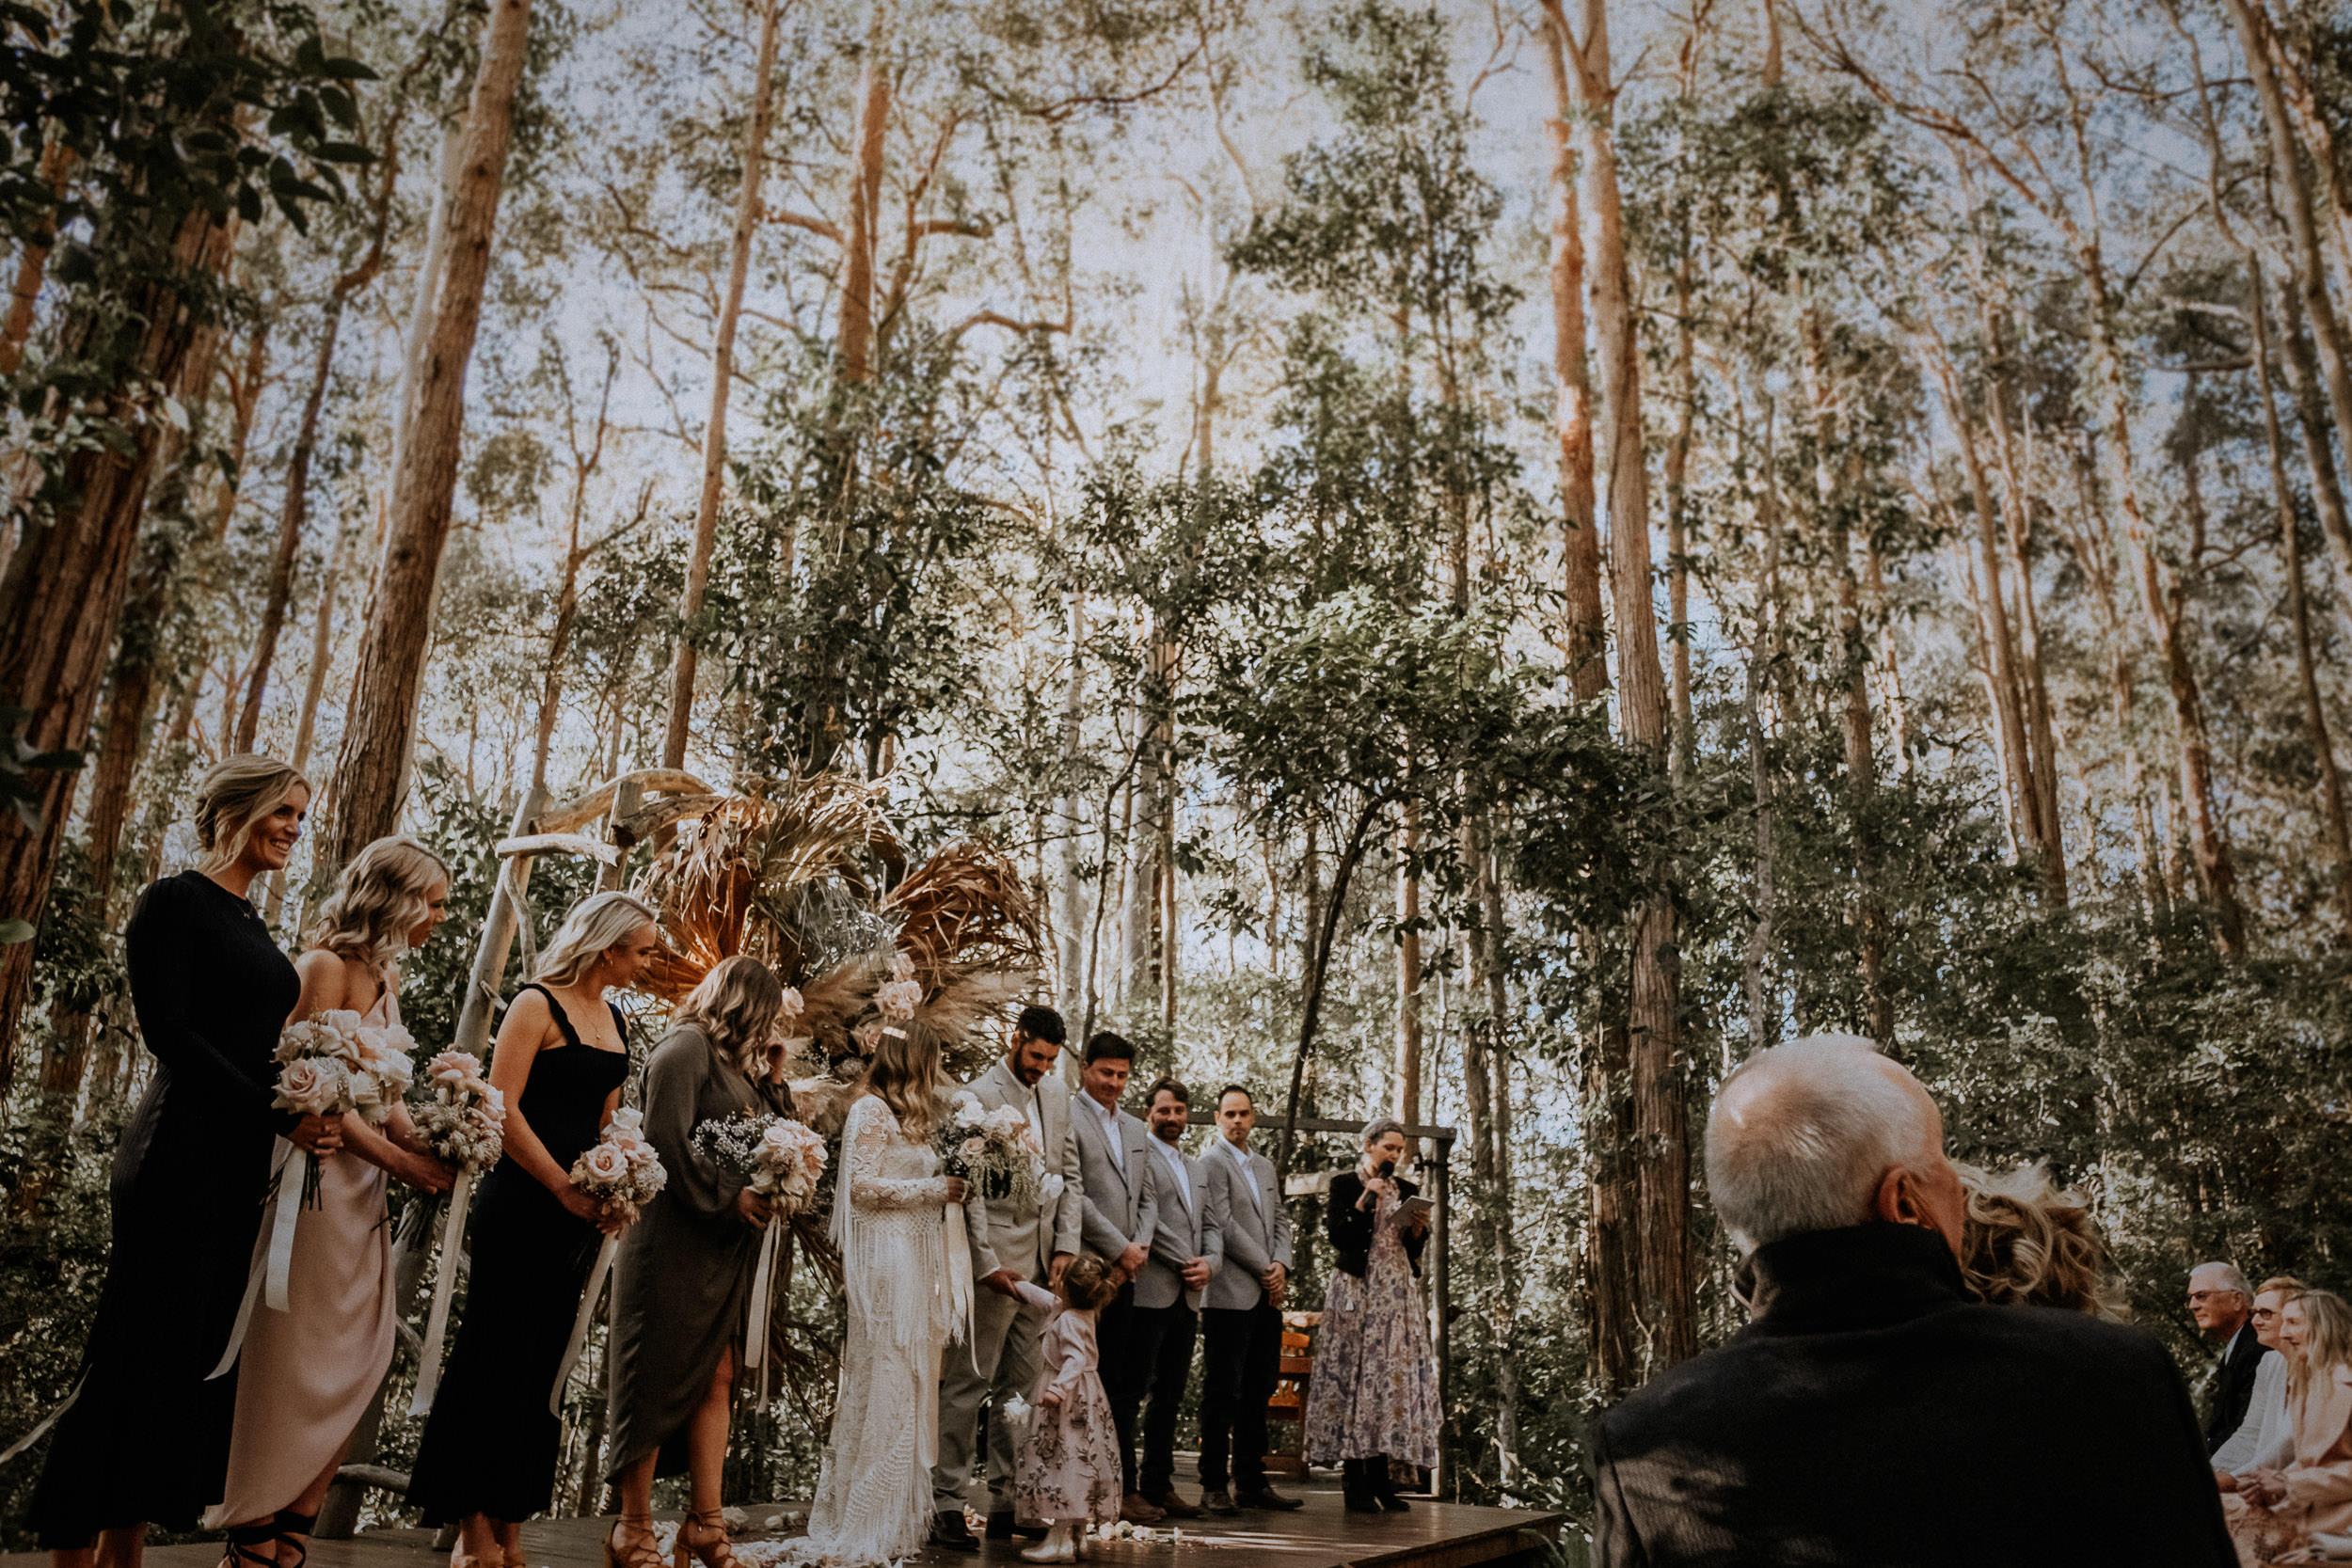 S&A Elopement - Kings & Thieves - Shred 'Til Dead - Central Coast Beach Forest Wedding - 188.jpg